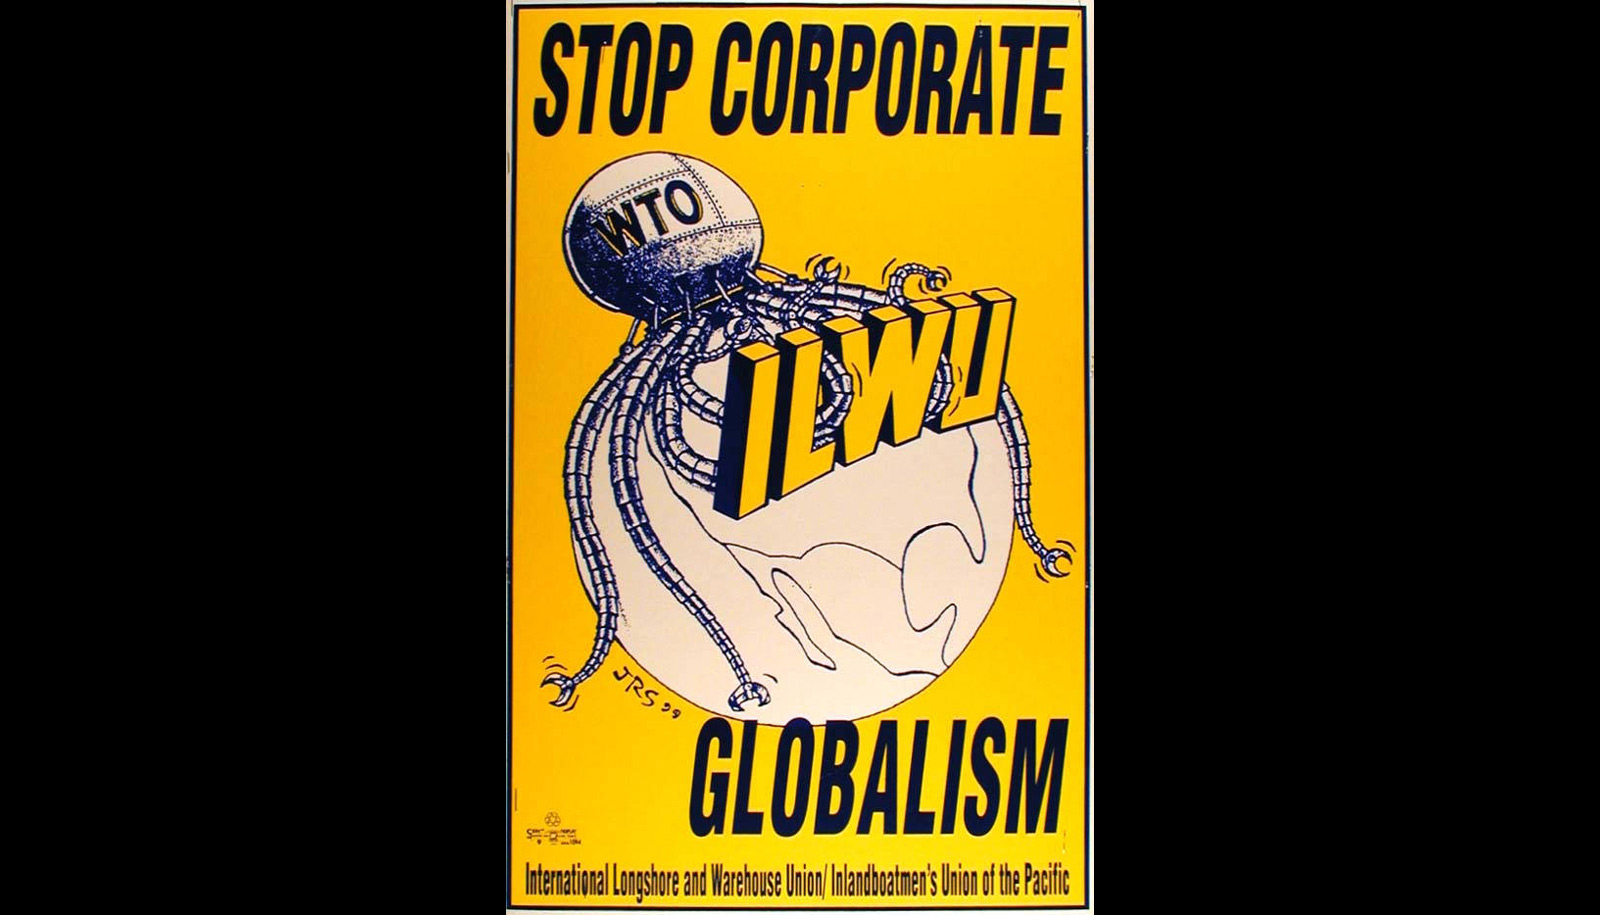 anti-WTO poster